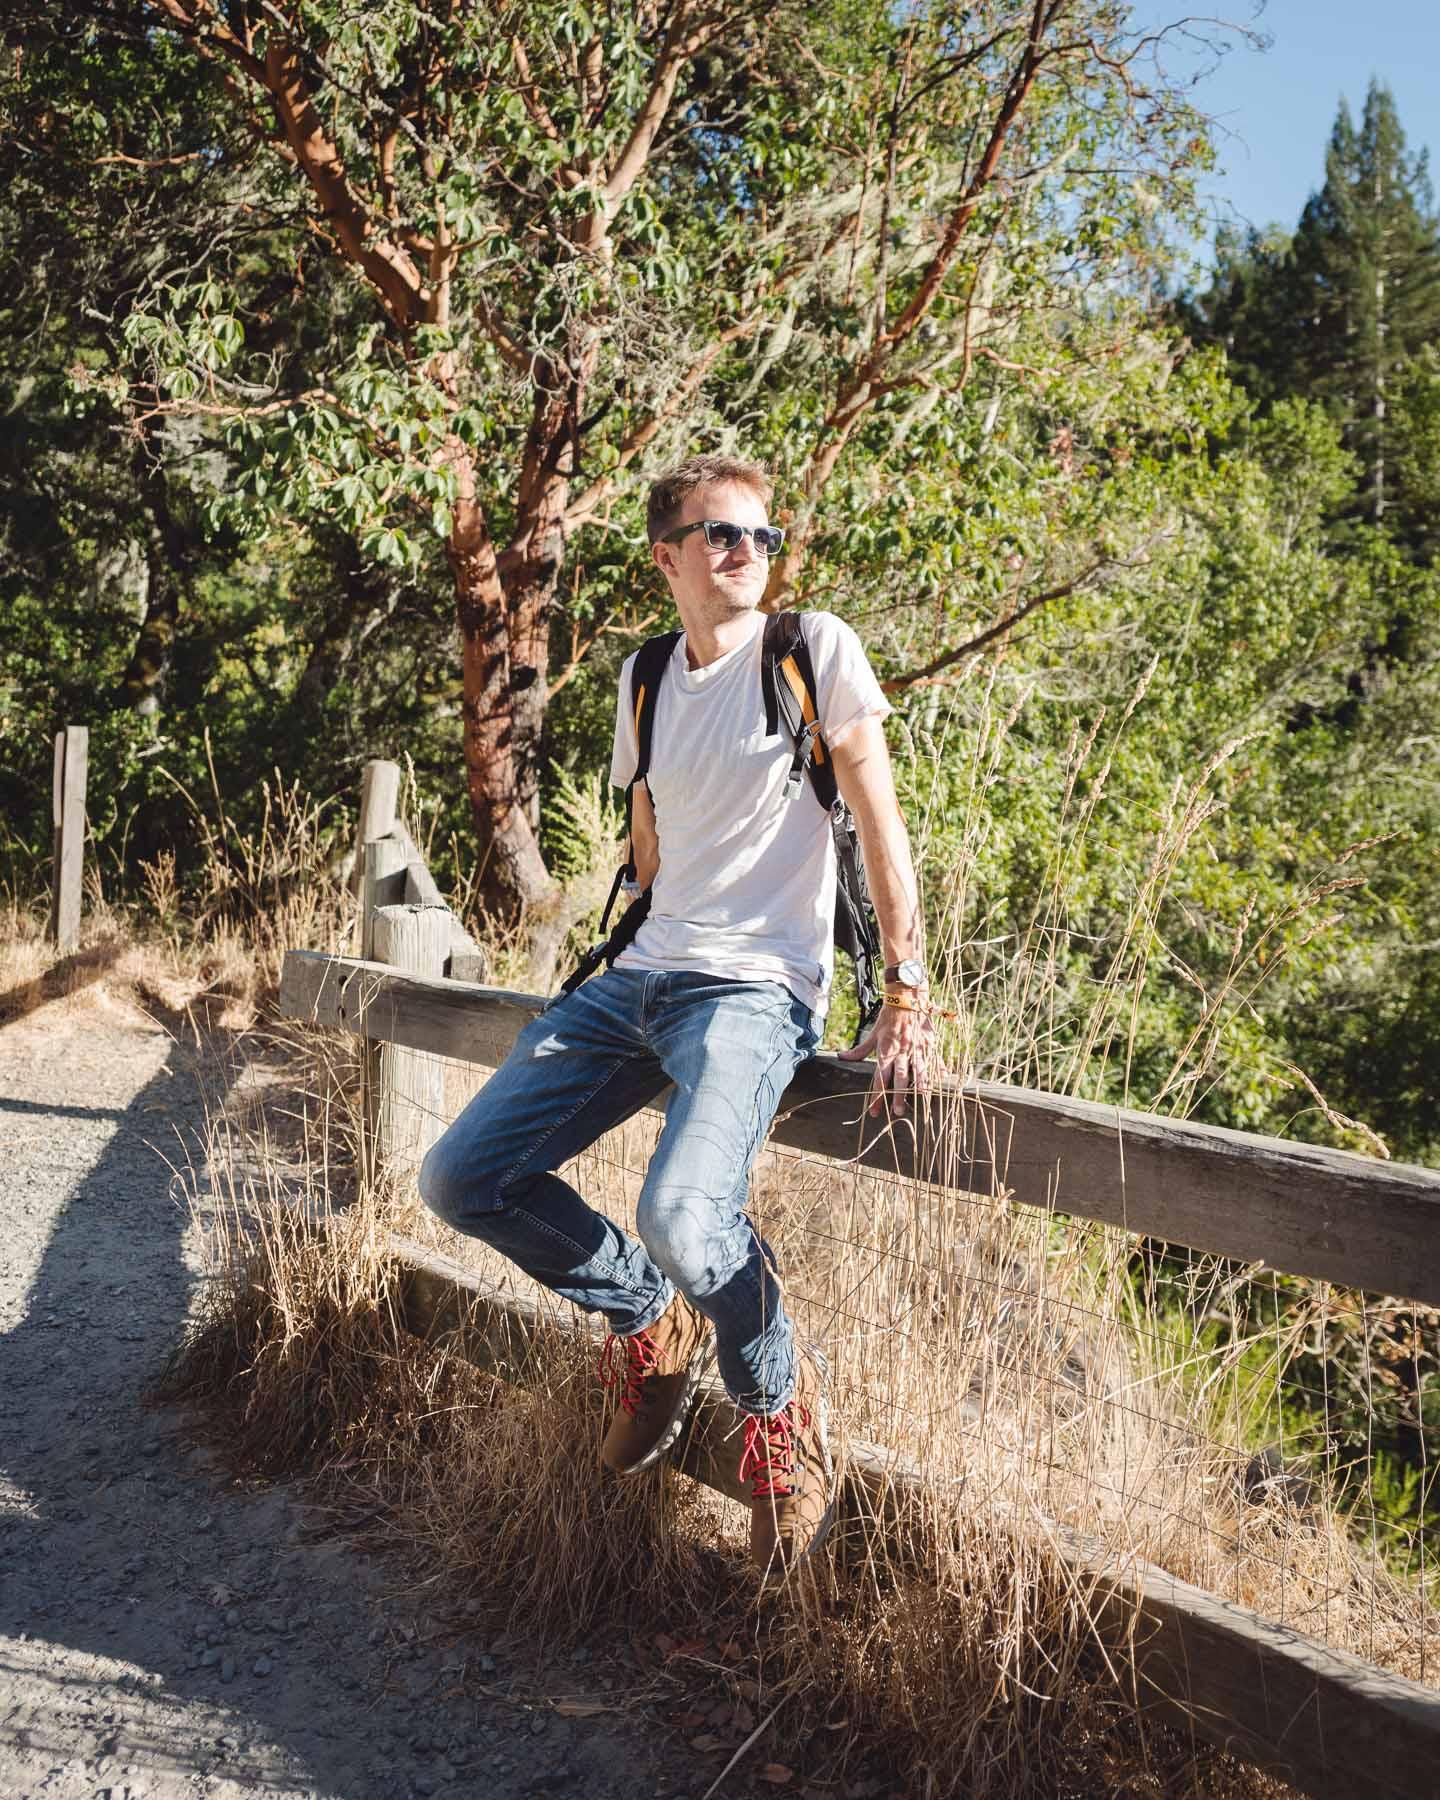 ZAPPOS x MERRELL SHOOT 2 Ontario Boots Trail Kale Instagram 8